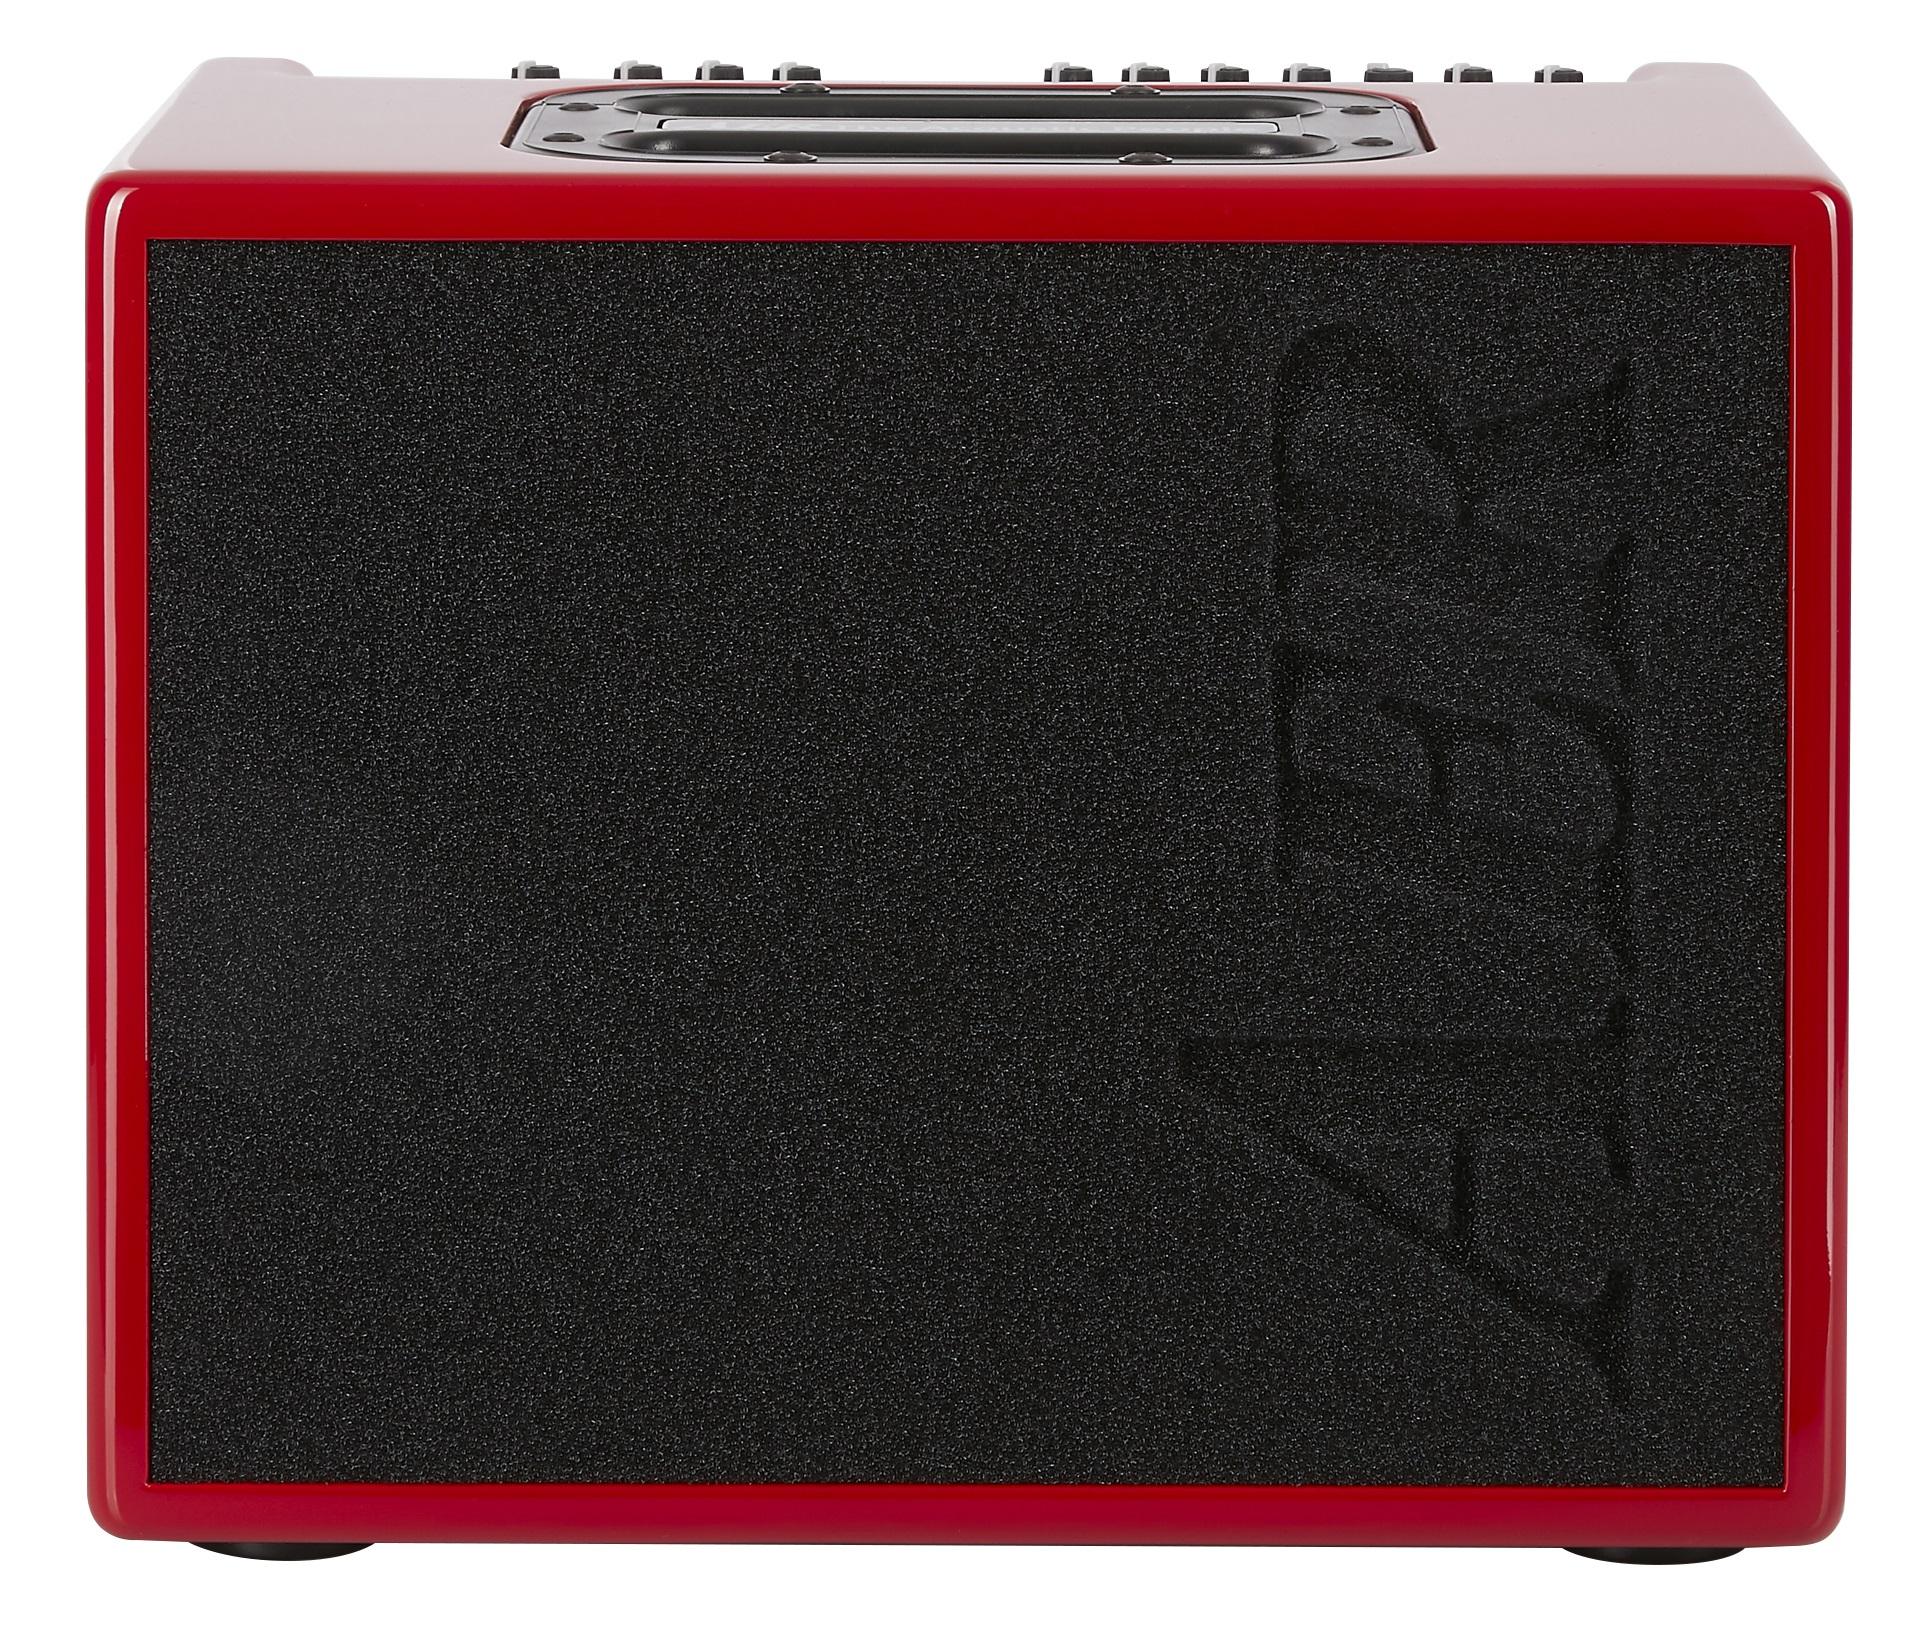 Aer Compact 60 IV Red High Gloss